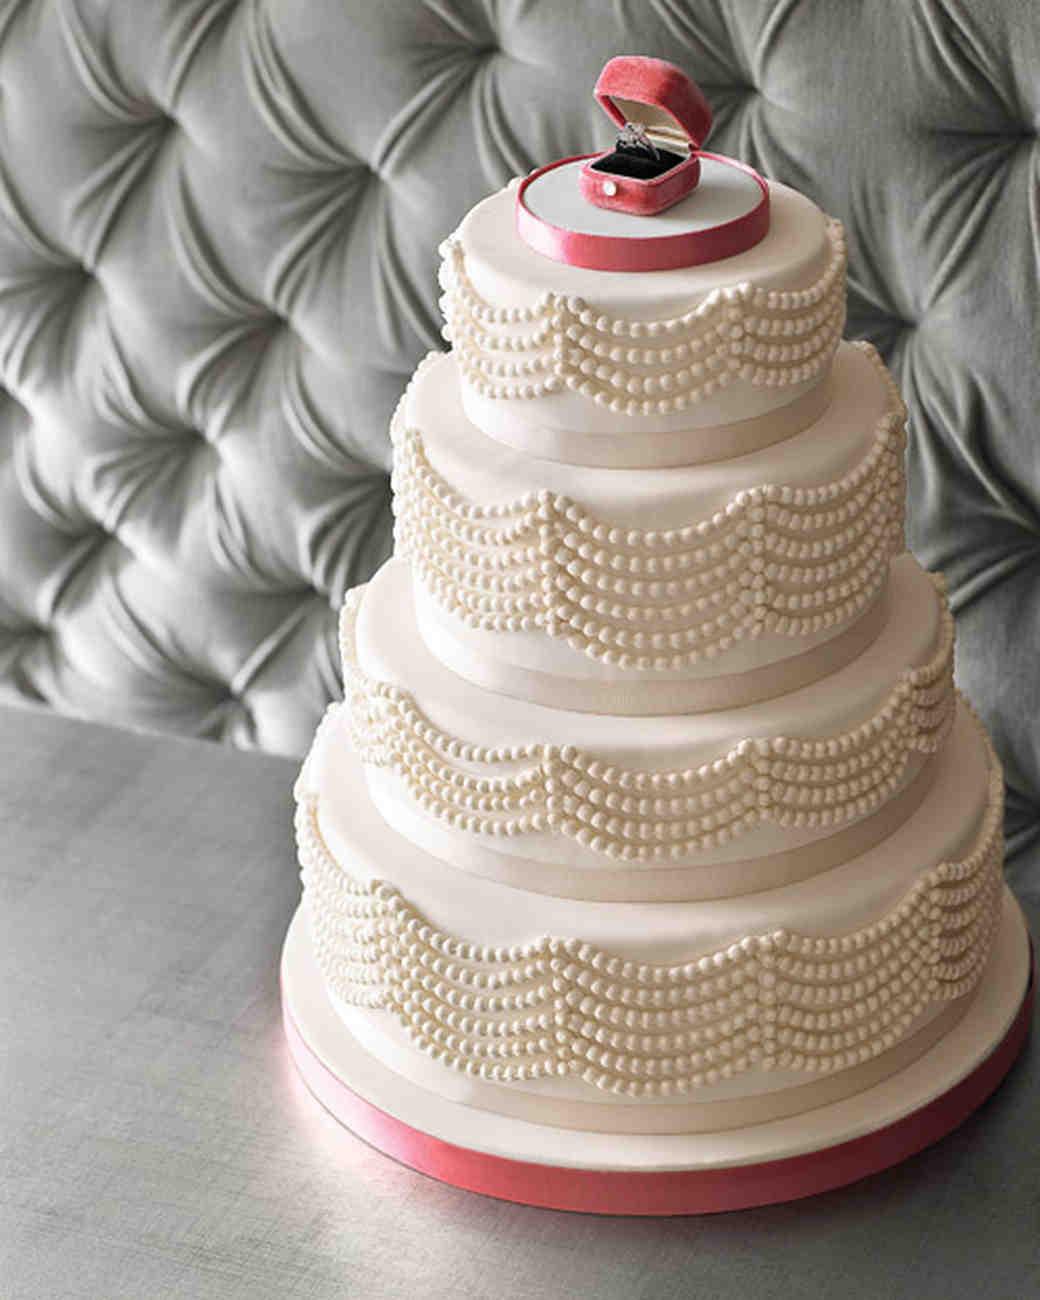 Bejeweled Wedding Cakes Martha Stewart Weddings